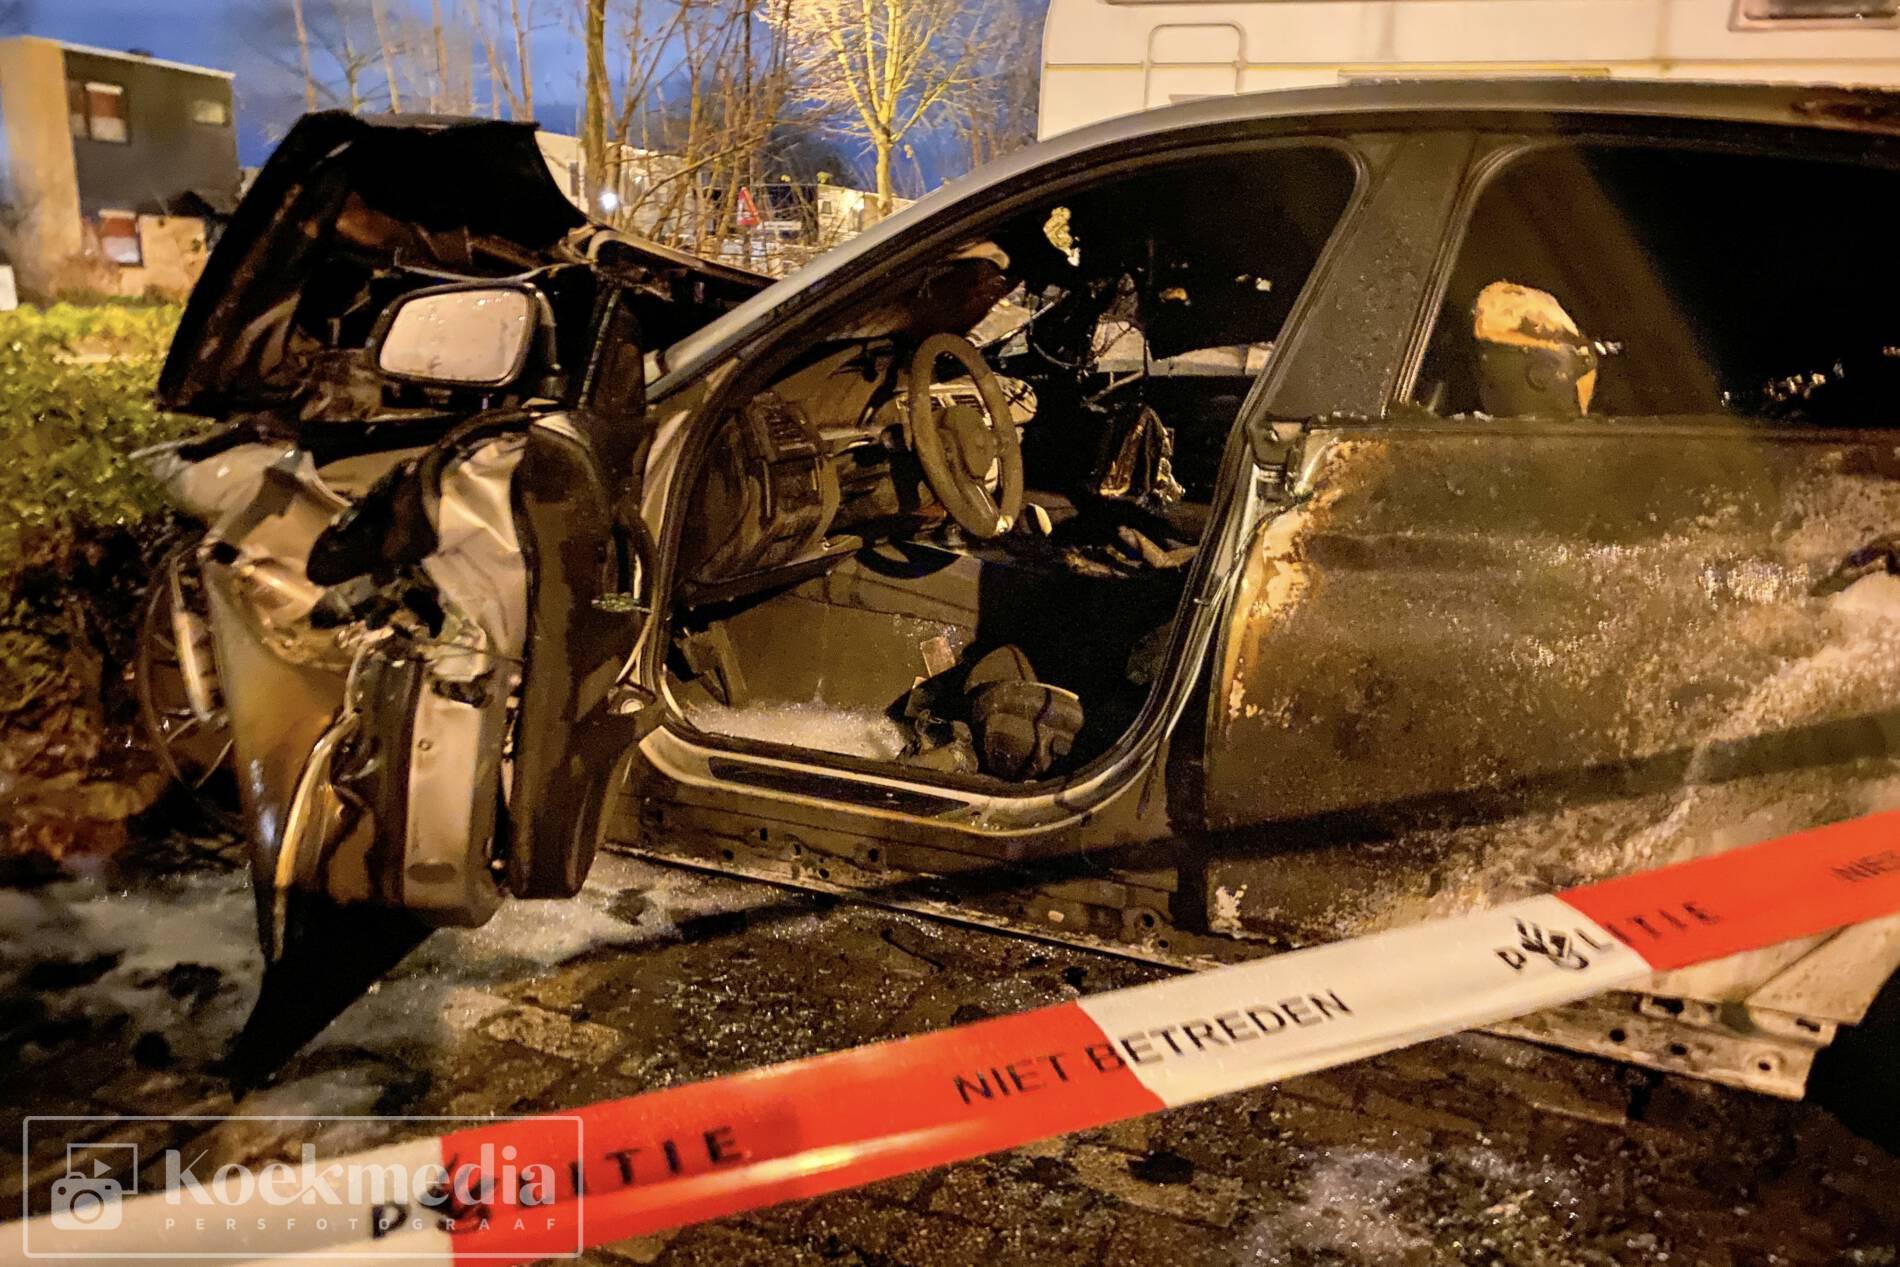 Twee auto's volledig uitgebrand Olmendreef Vlaardingen